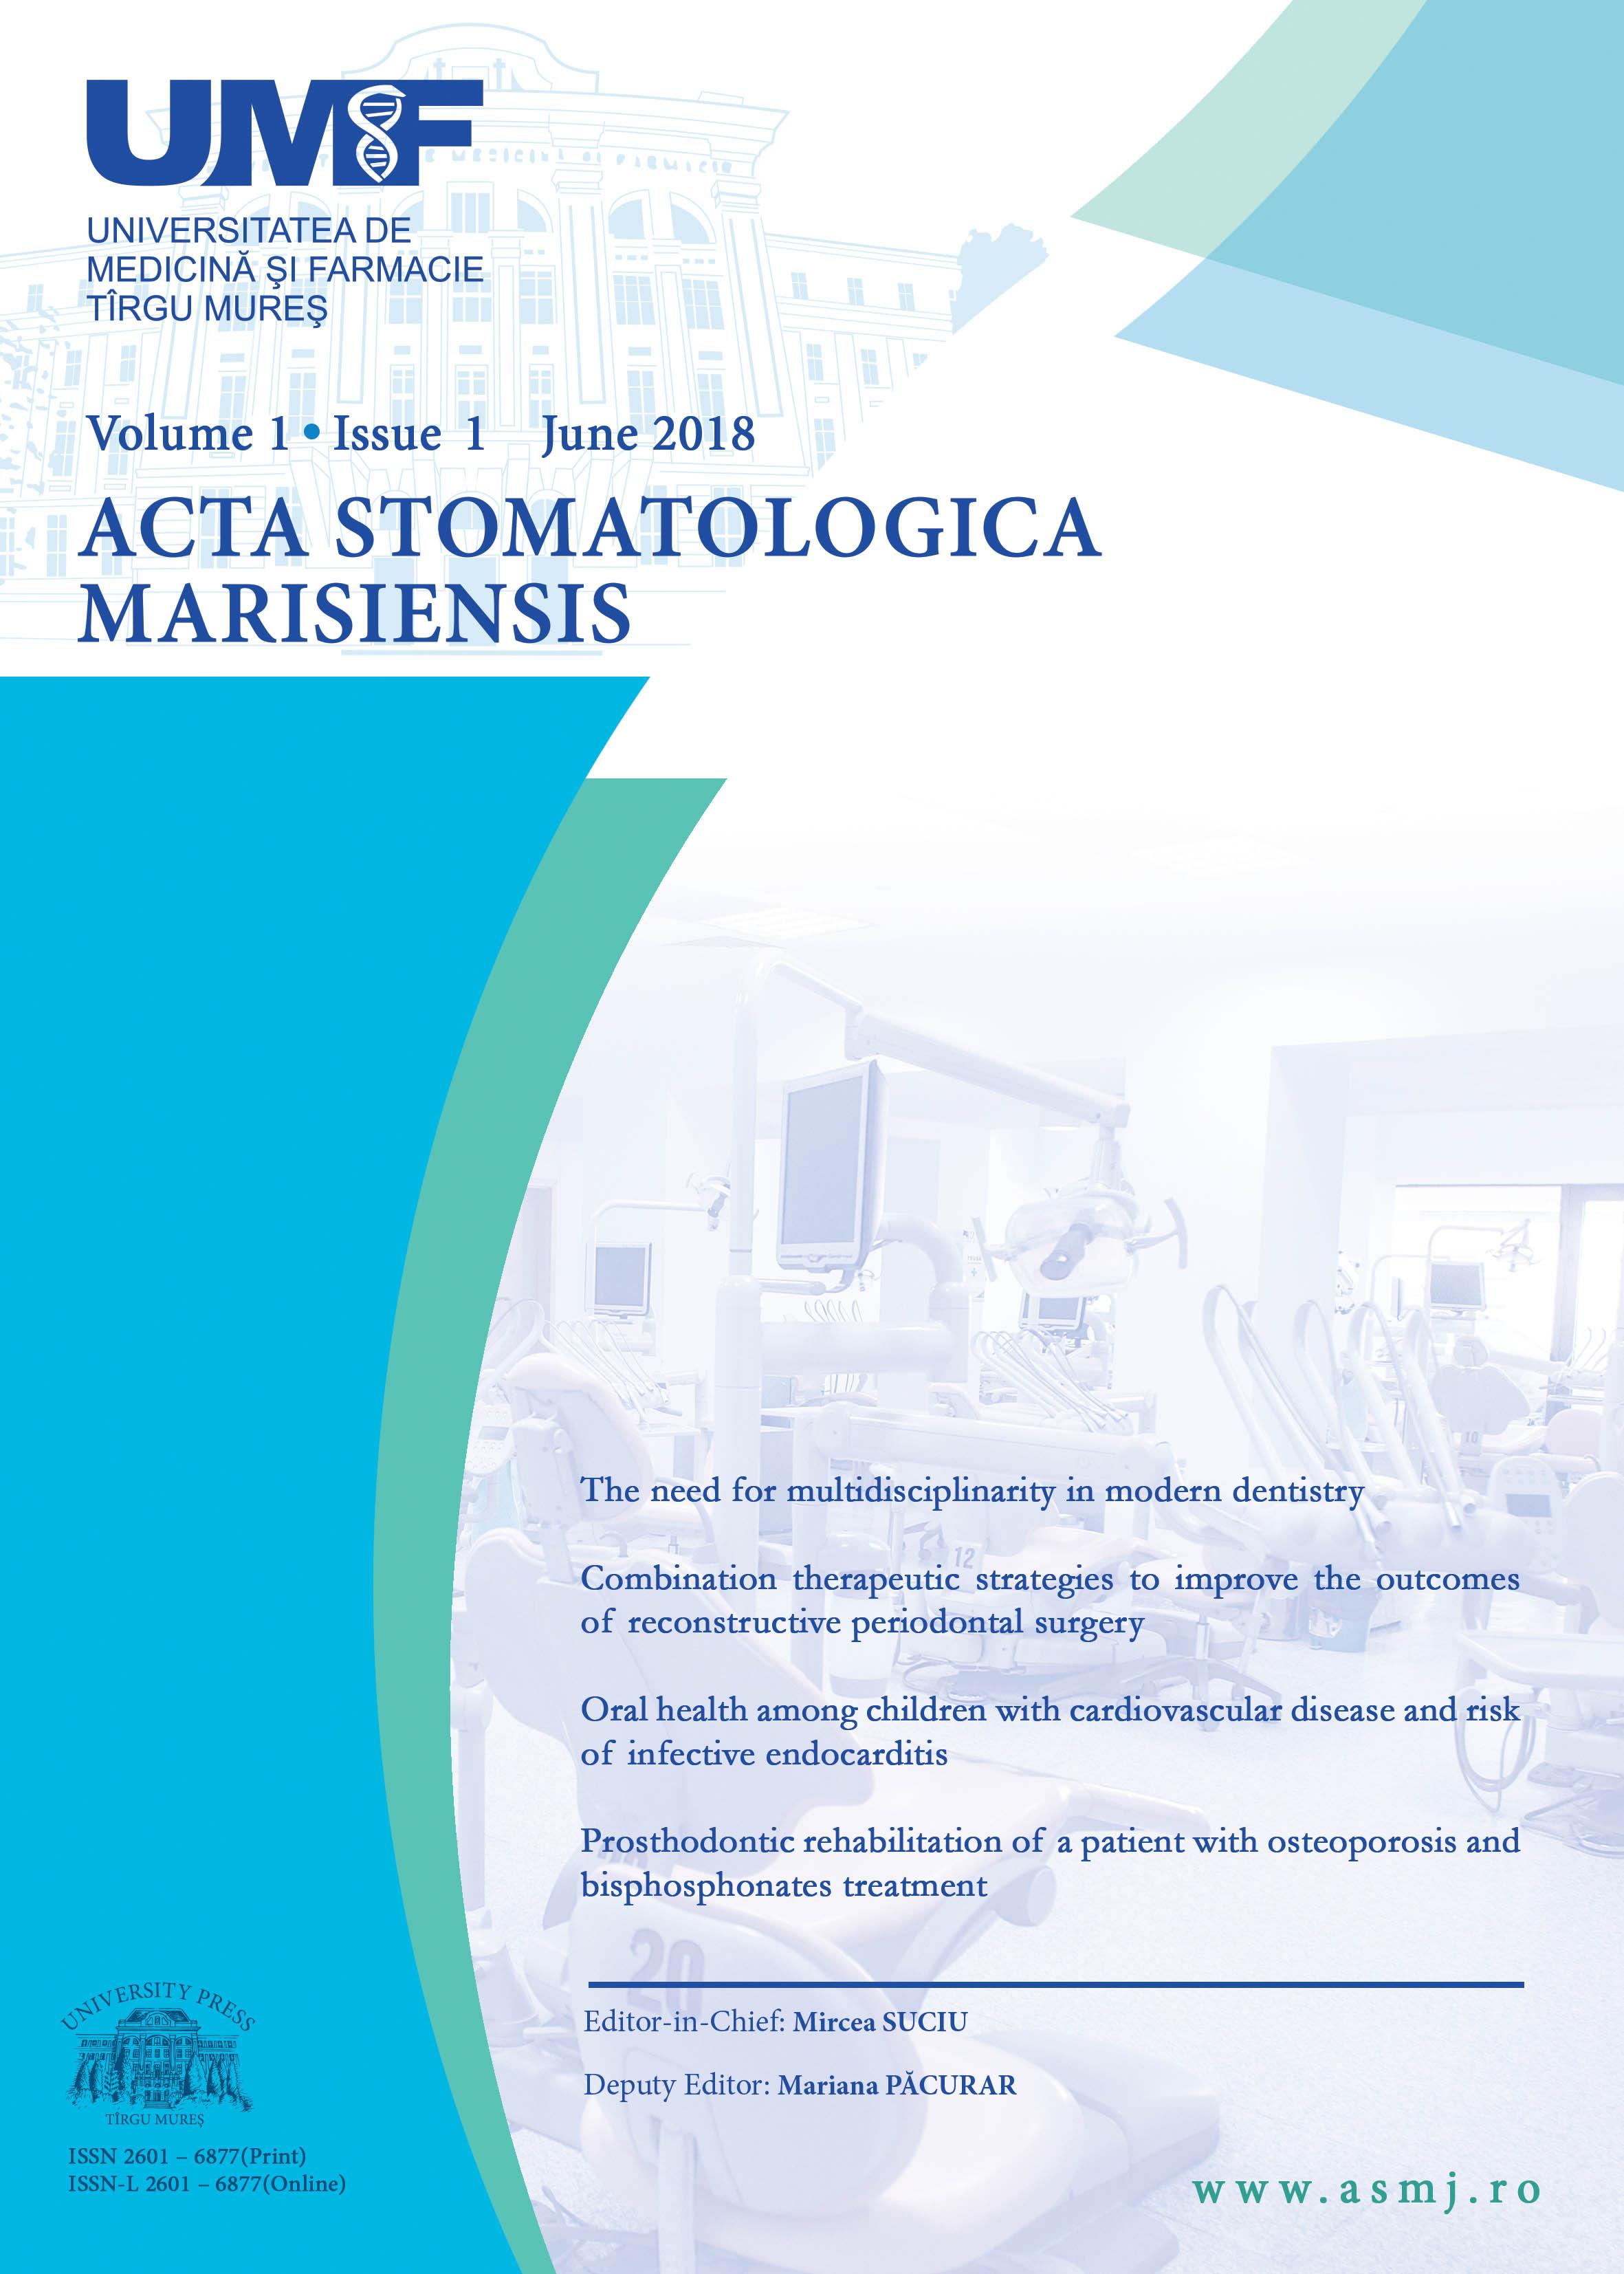 UMF Tîrgu Mureș anunță lansarea revistei Acta Stomatologica Marisiensis